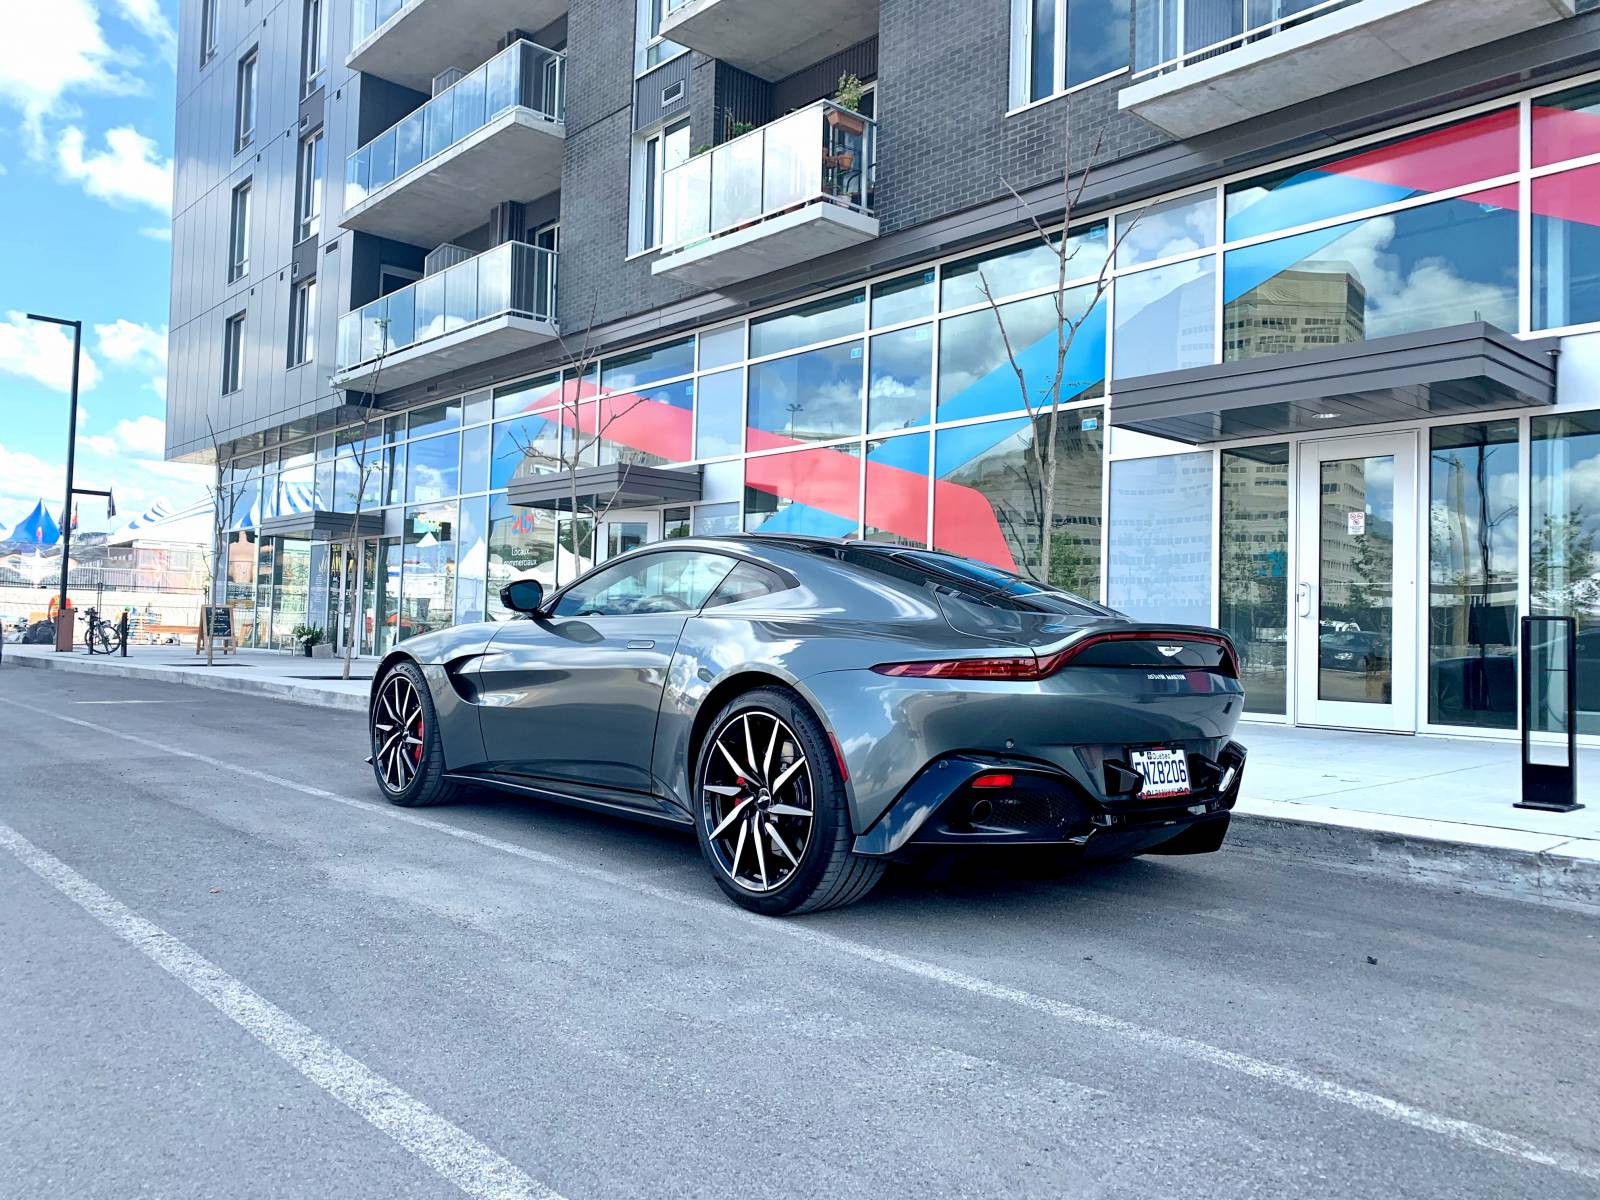 Aston Martin Lease Takeover In Ottawa Gatineau 2019 Aston Martin Vantage Automatic 2wd Id 6183 Leasecosts Canada